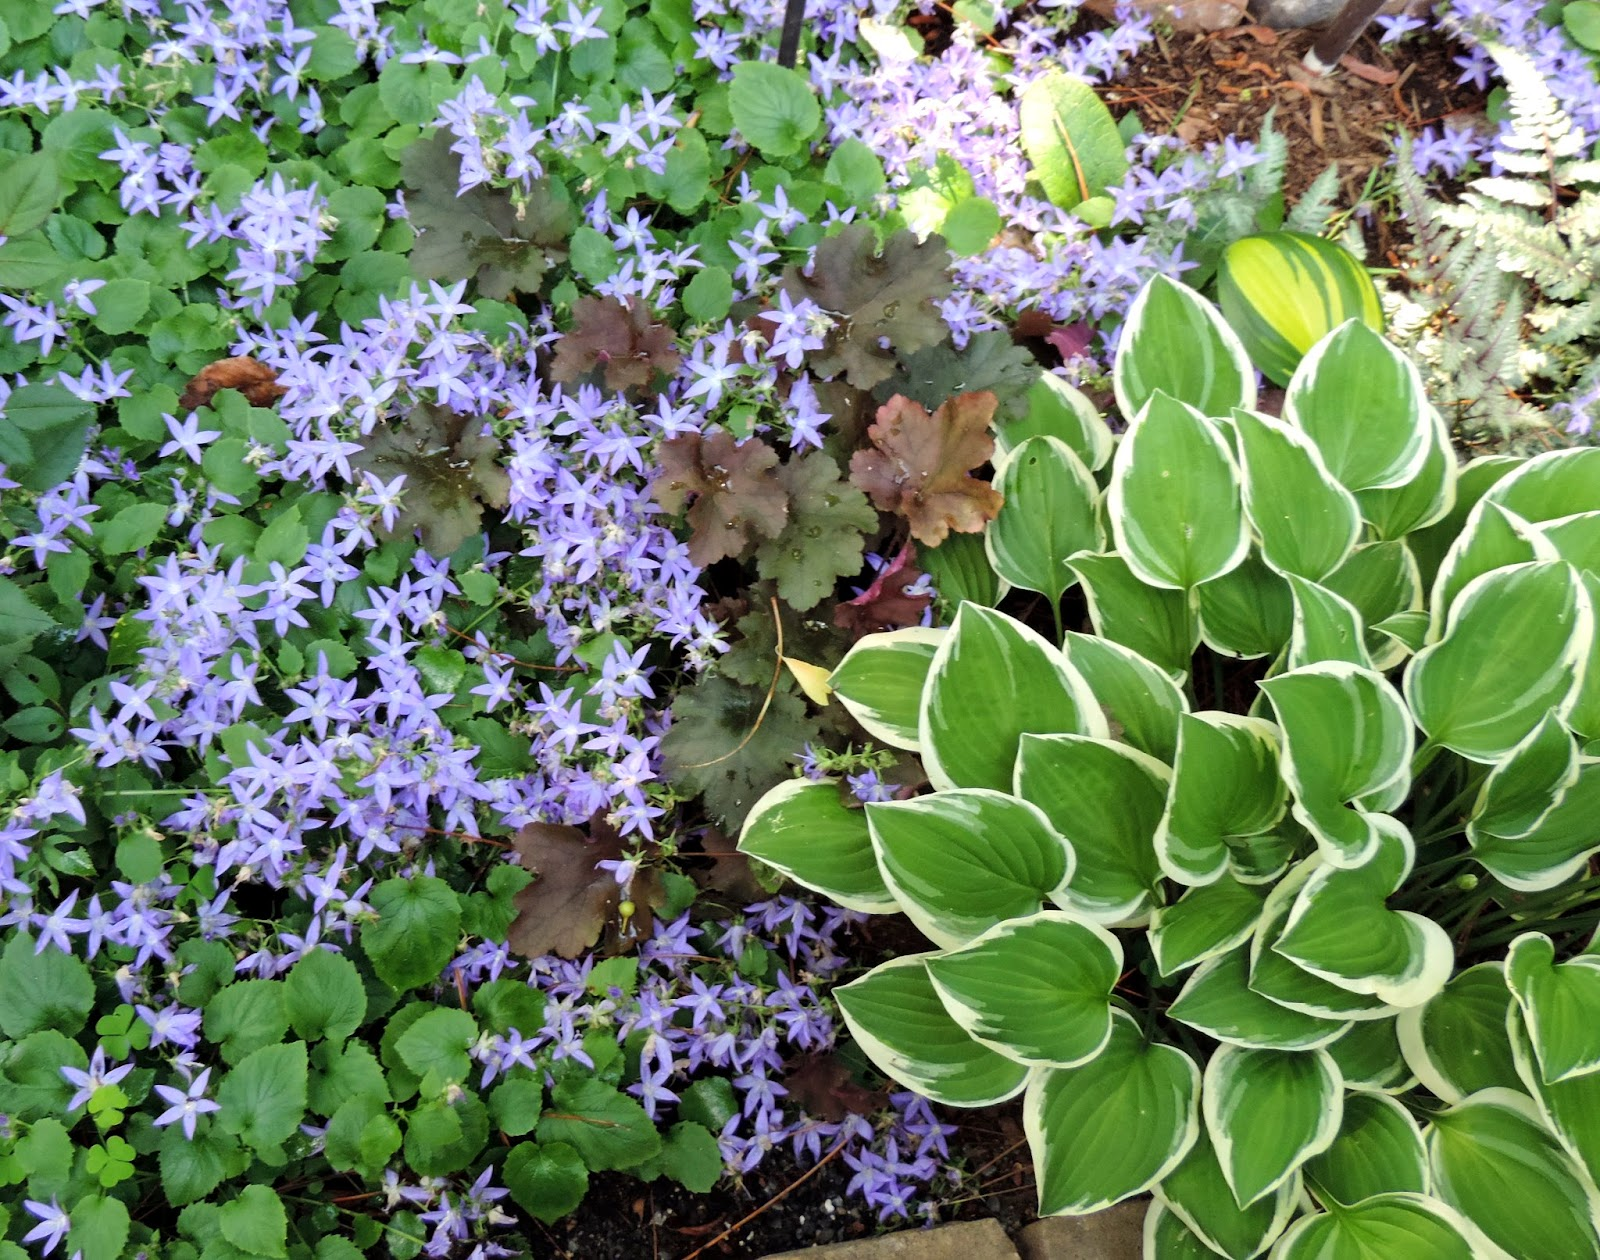 The Northern New York Gardener July Blooms